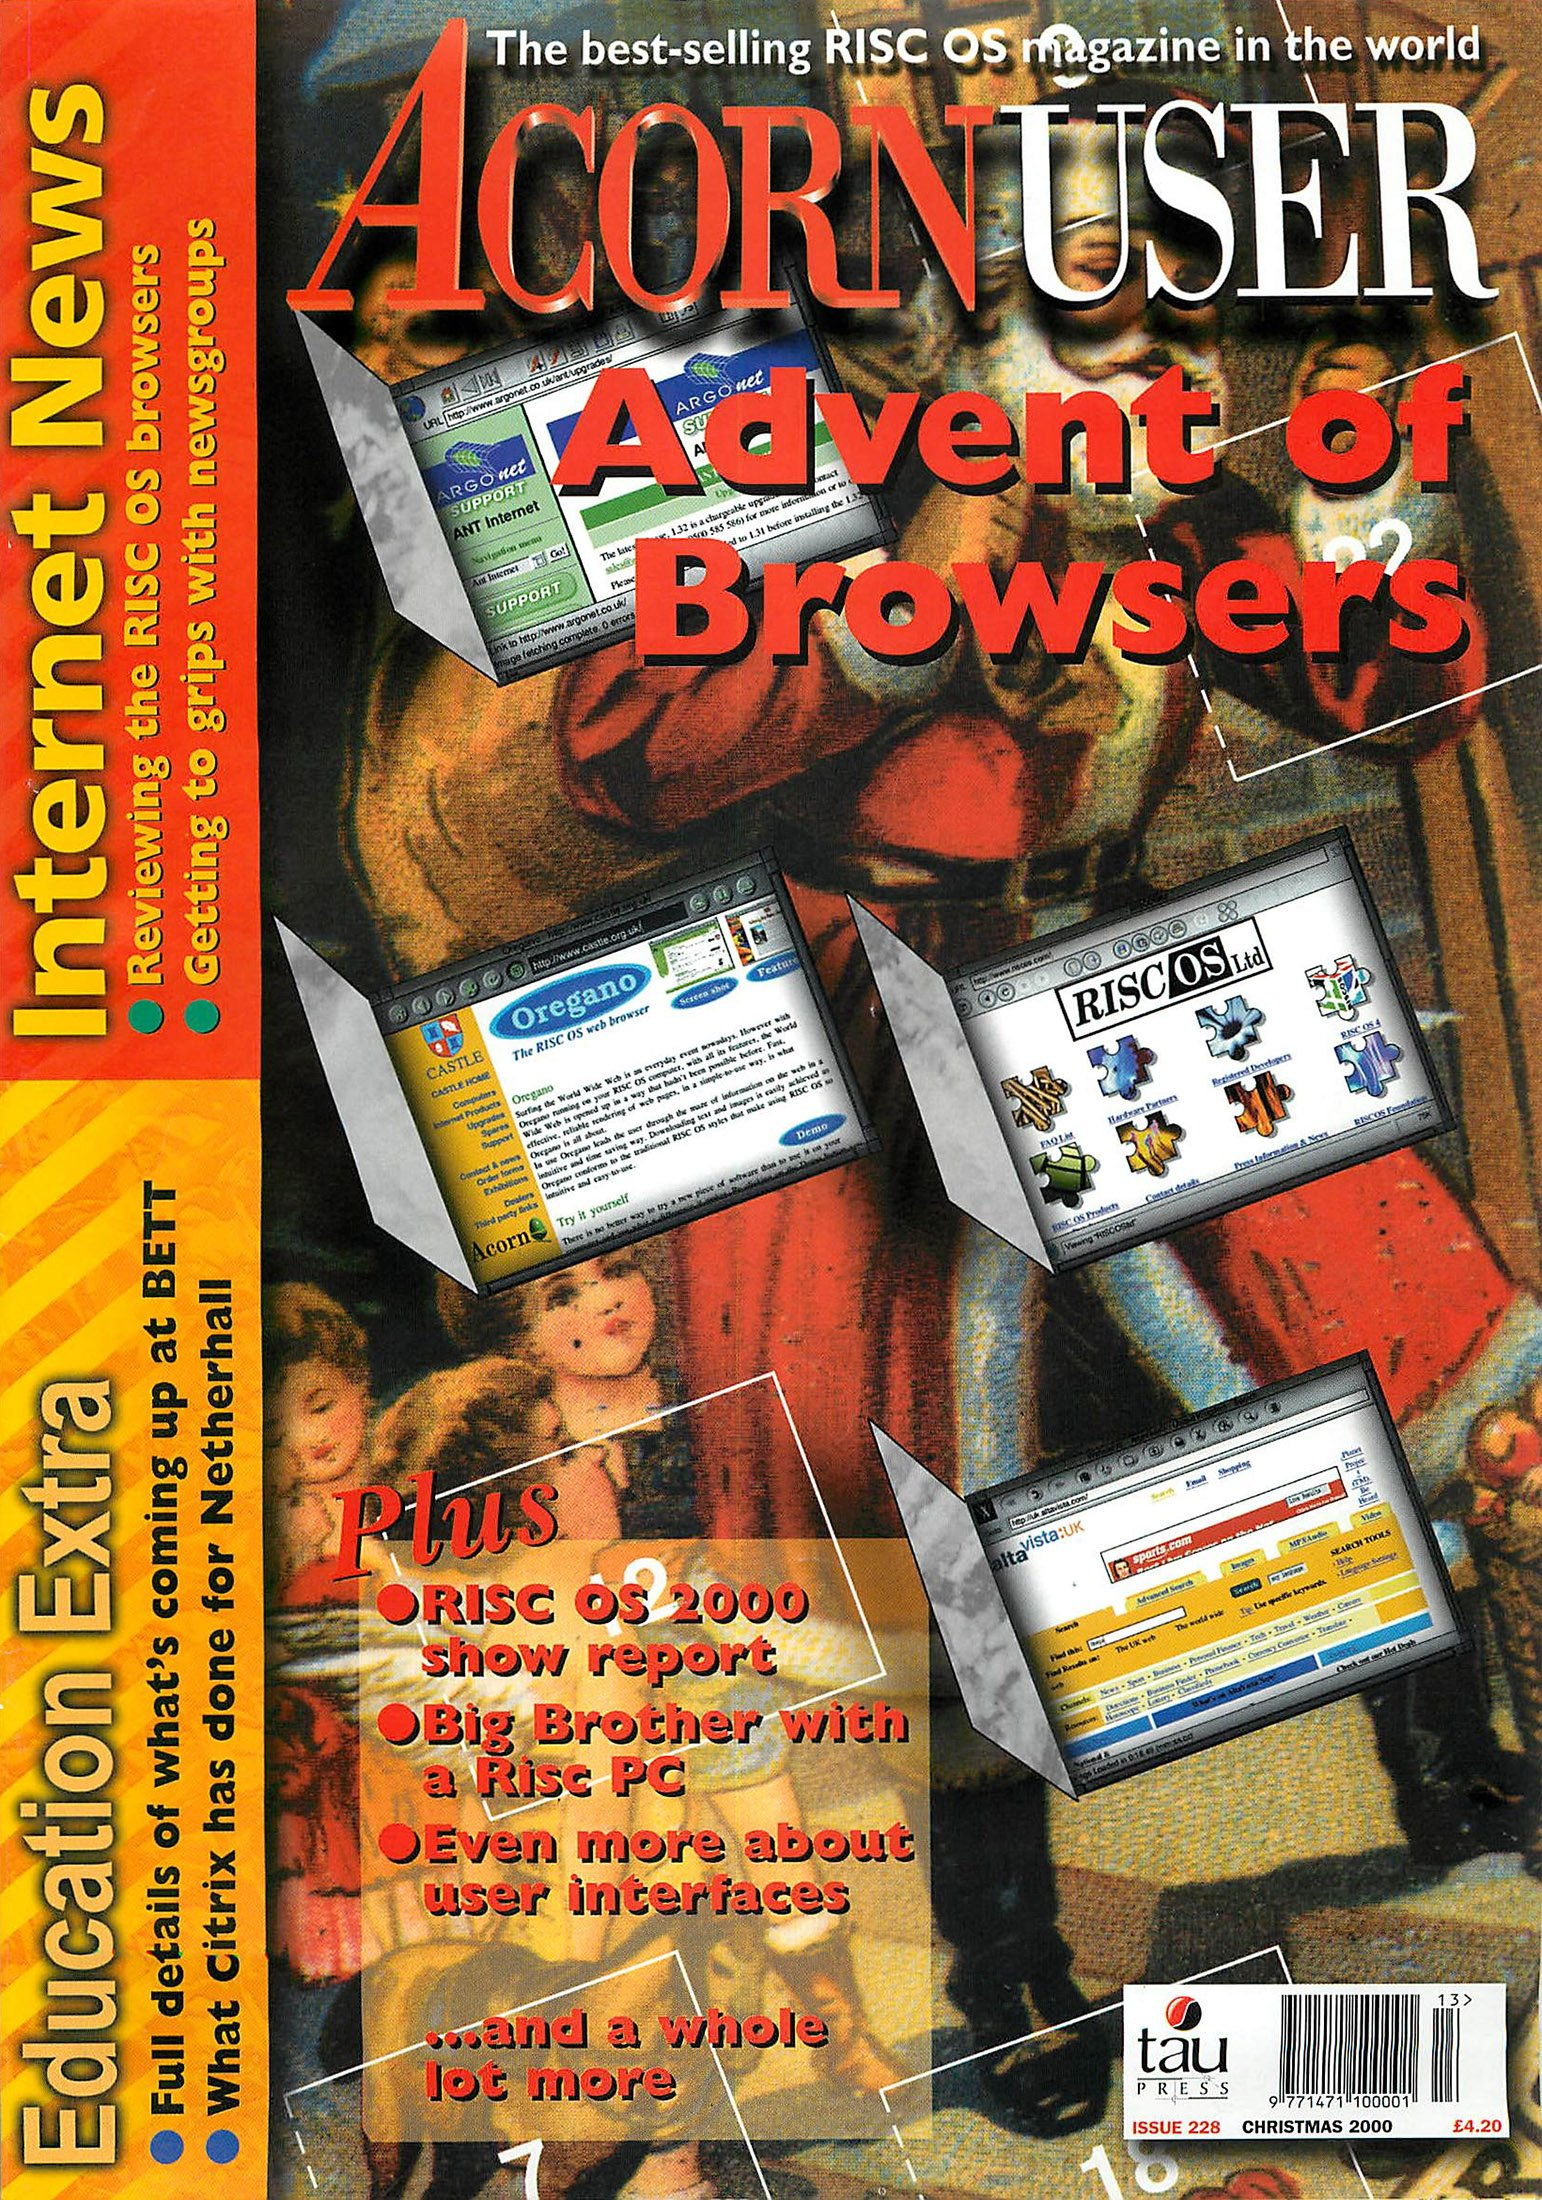 Acorn User 228 (Christmas 2000)